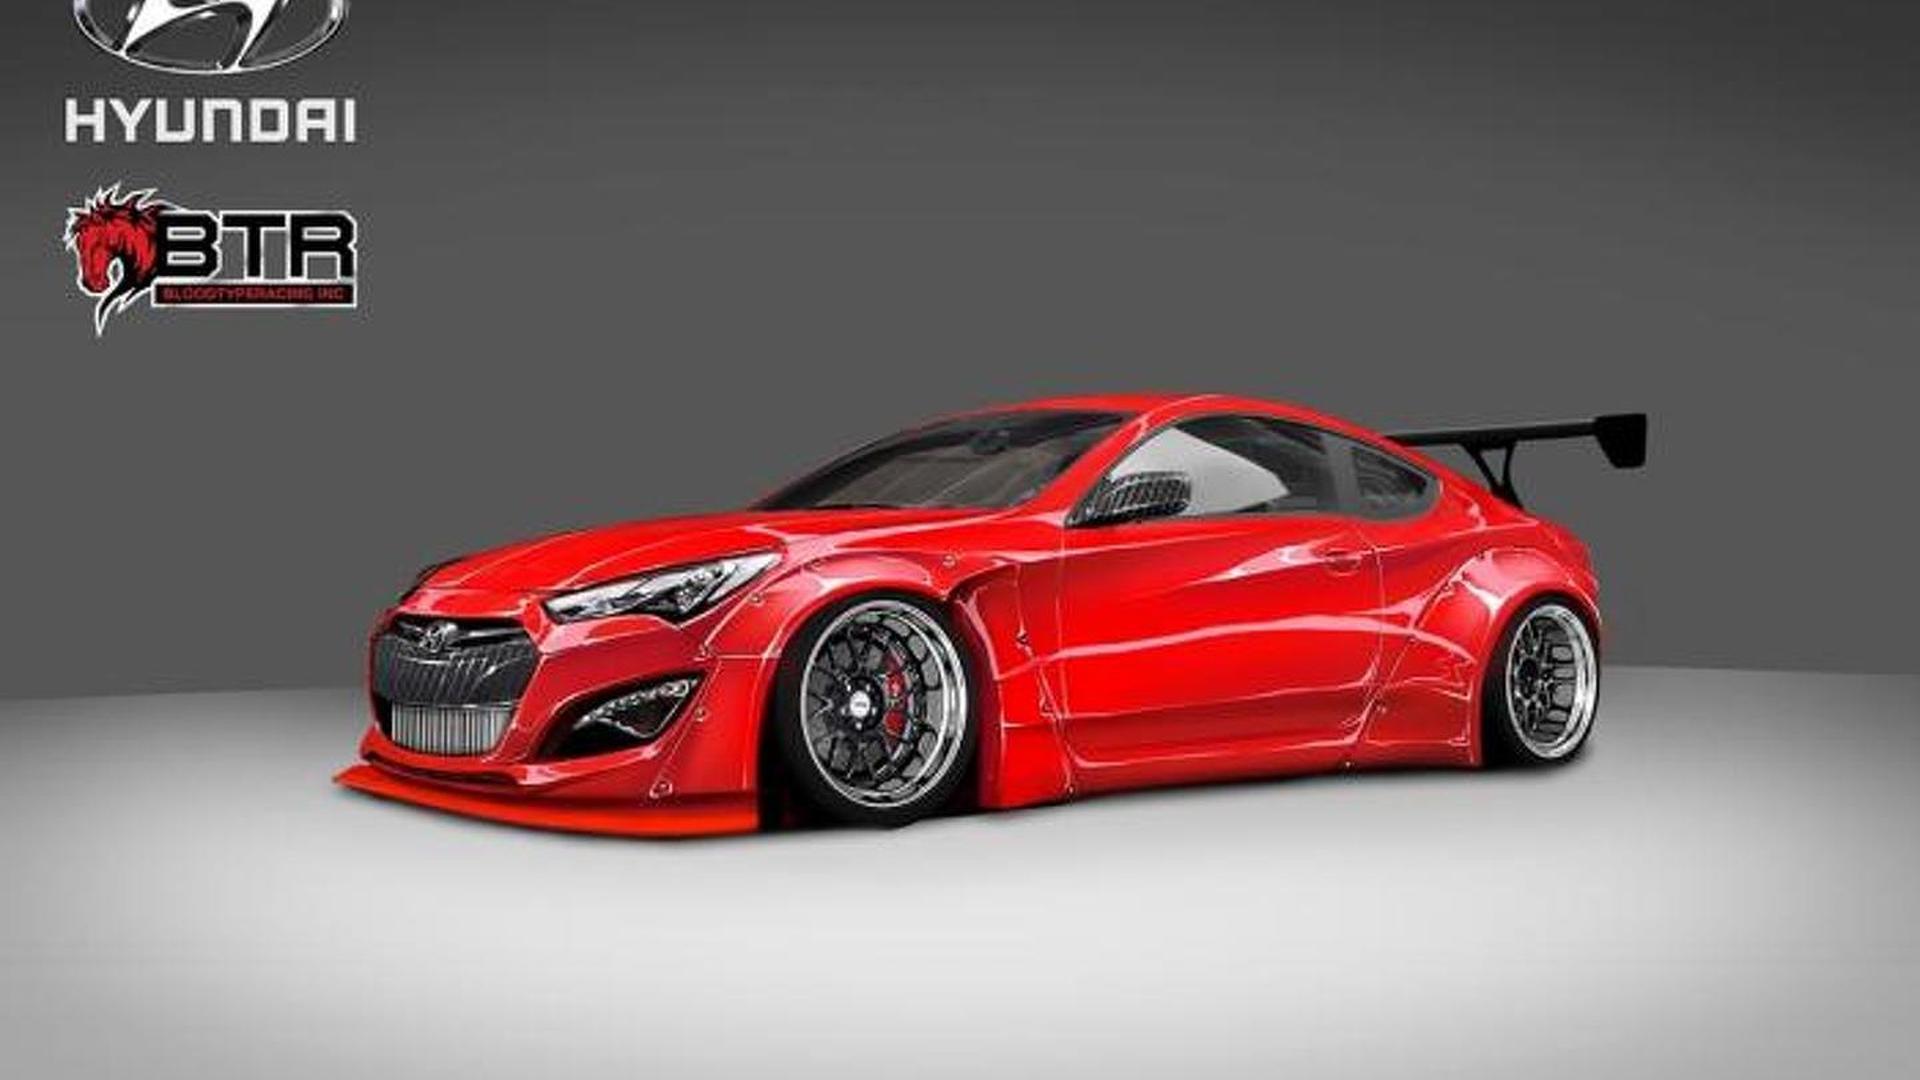 Hyundai & Blood Type Racing unveil their 800 bhp Genesis Coupe for SEMA